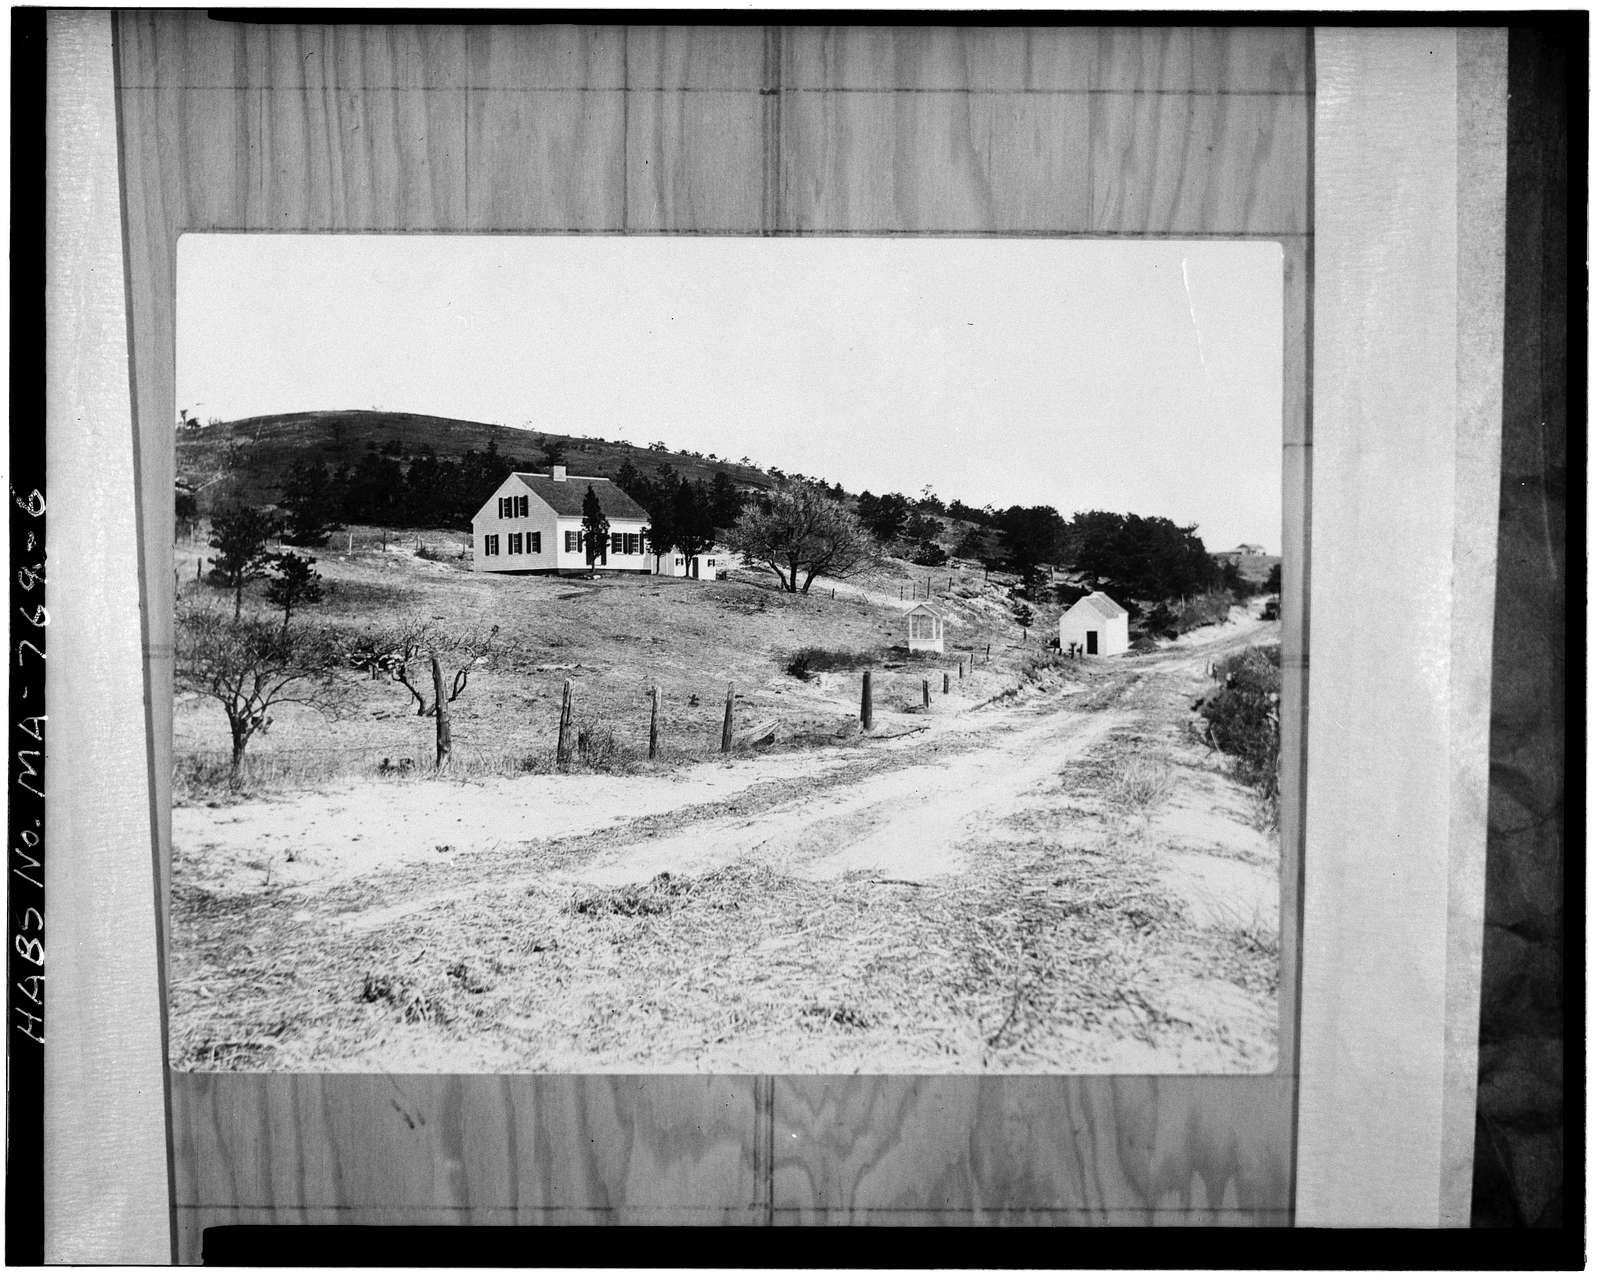 Joshua Snow House, North Pamet Road, Truro, Barnstable County, MA